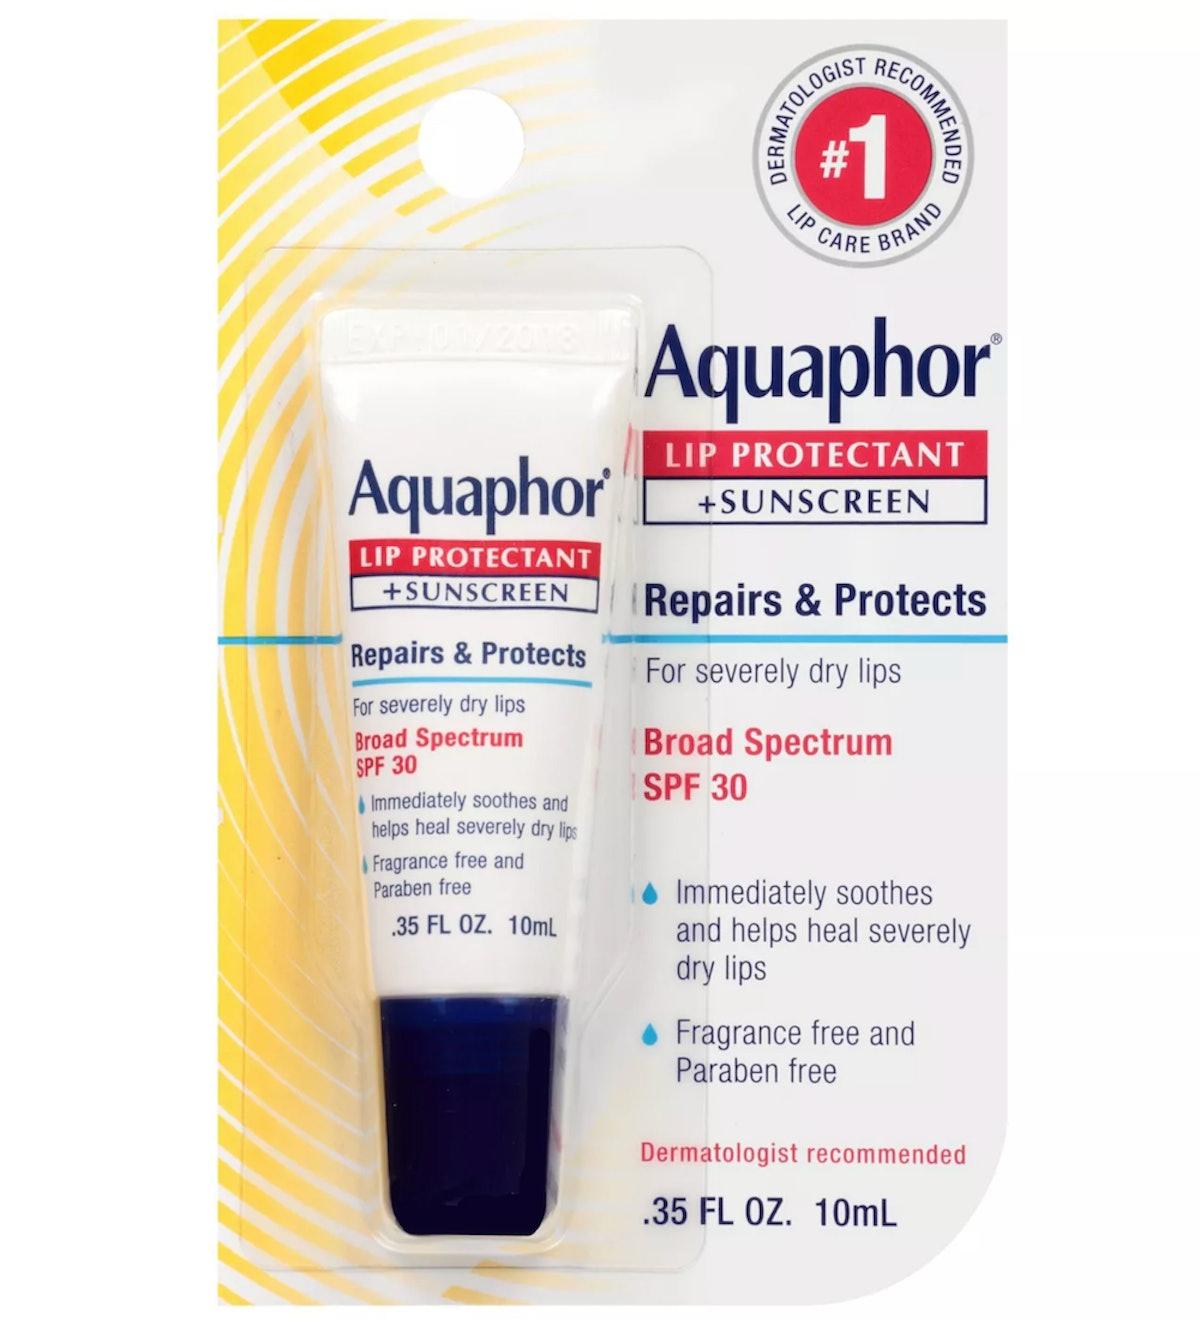 Aquaphor Lip Protectant + Sunscreen Lip Balm - SPF 30